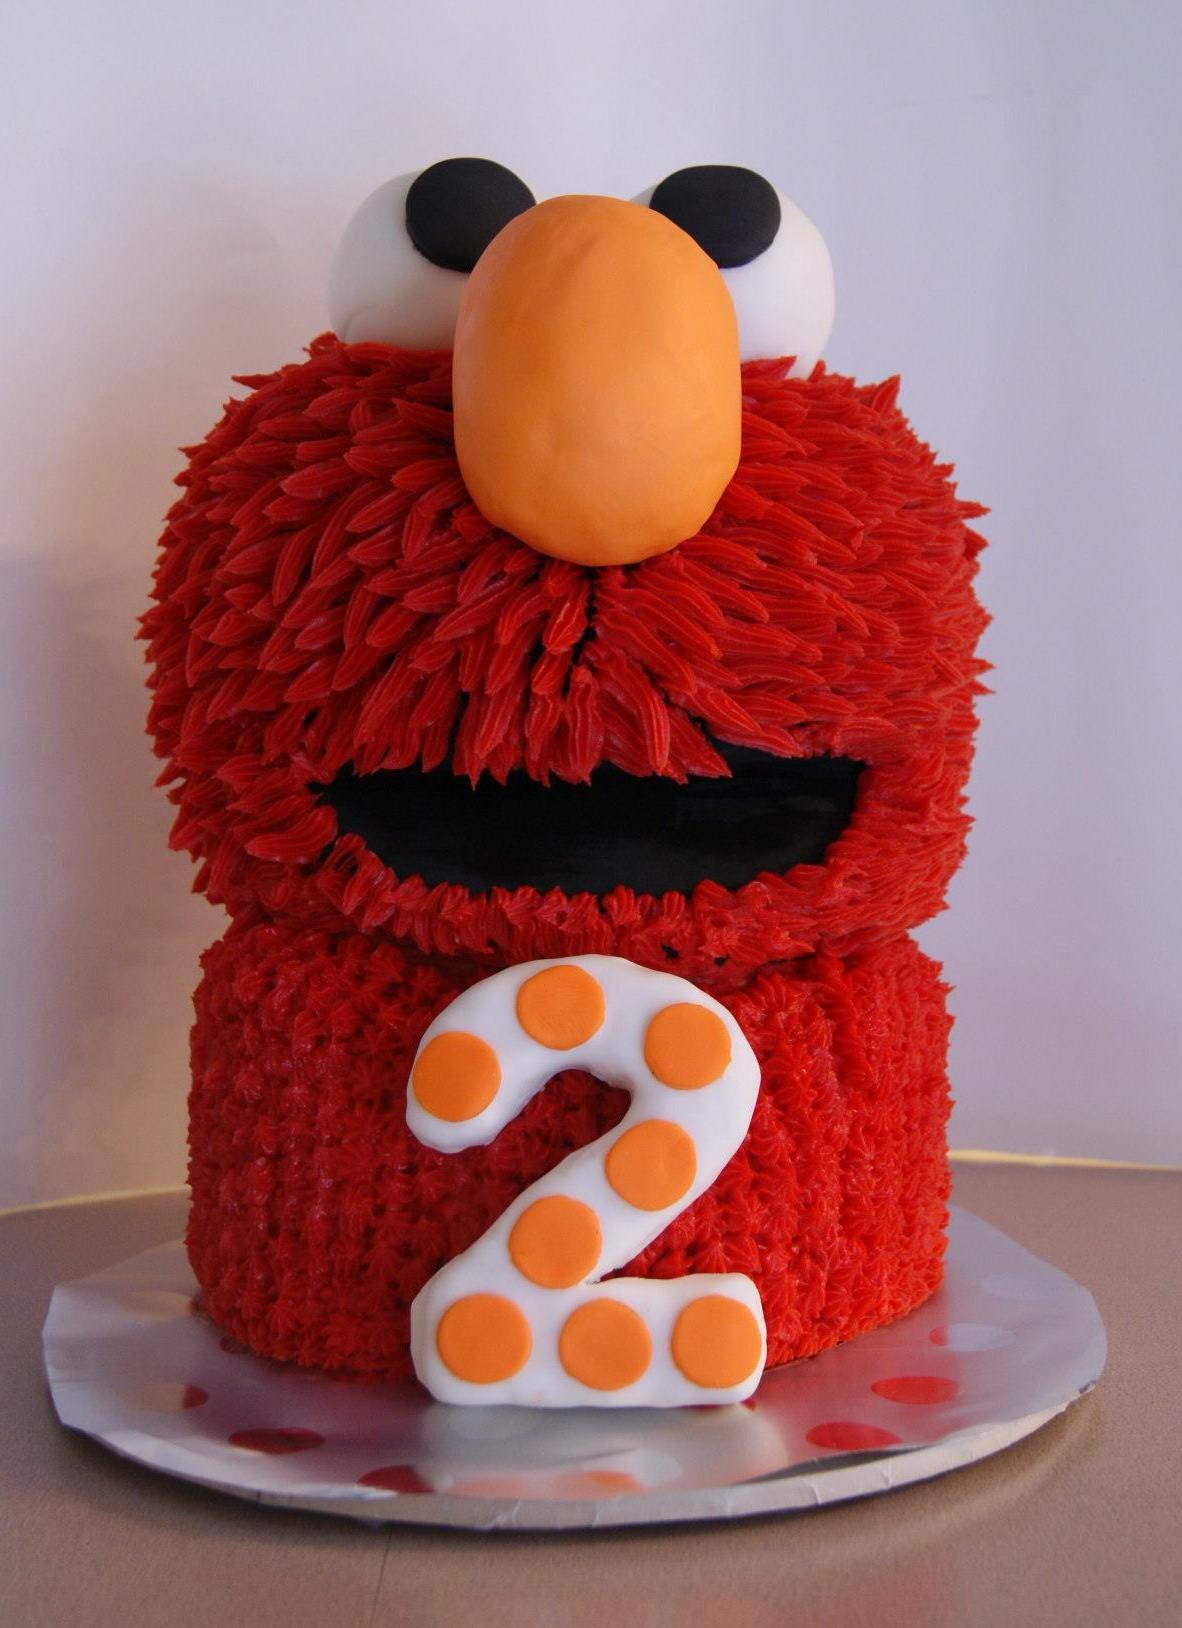 Elmo Birthday Cake Decorations